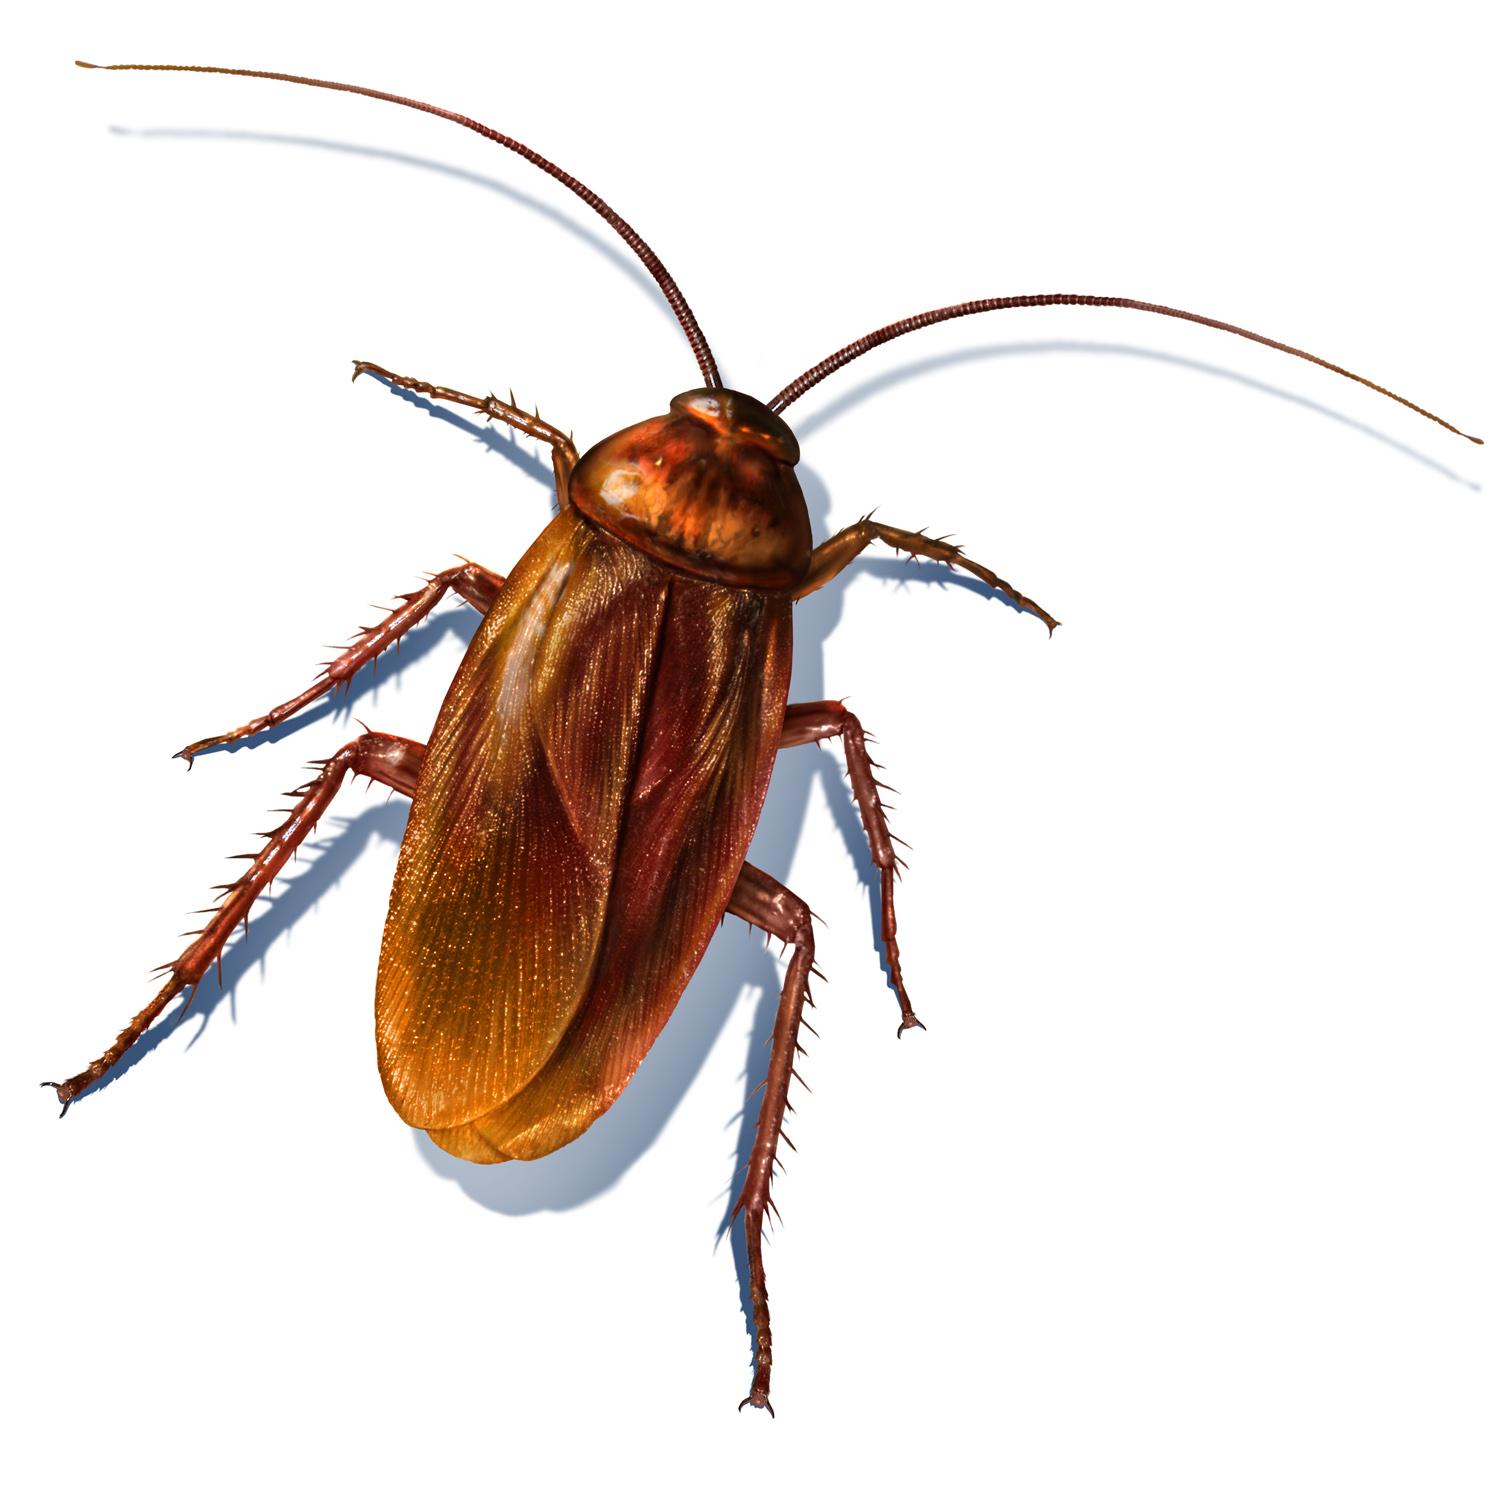 Jeff's Cockroach